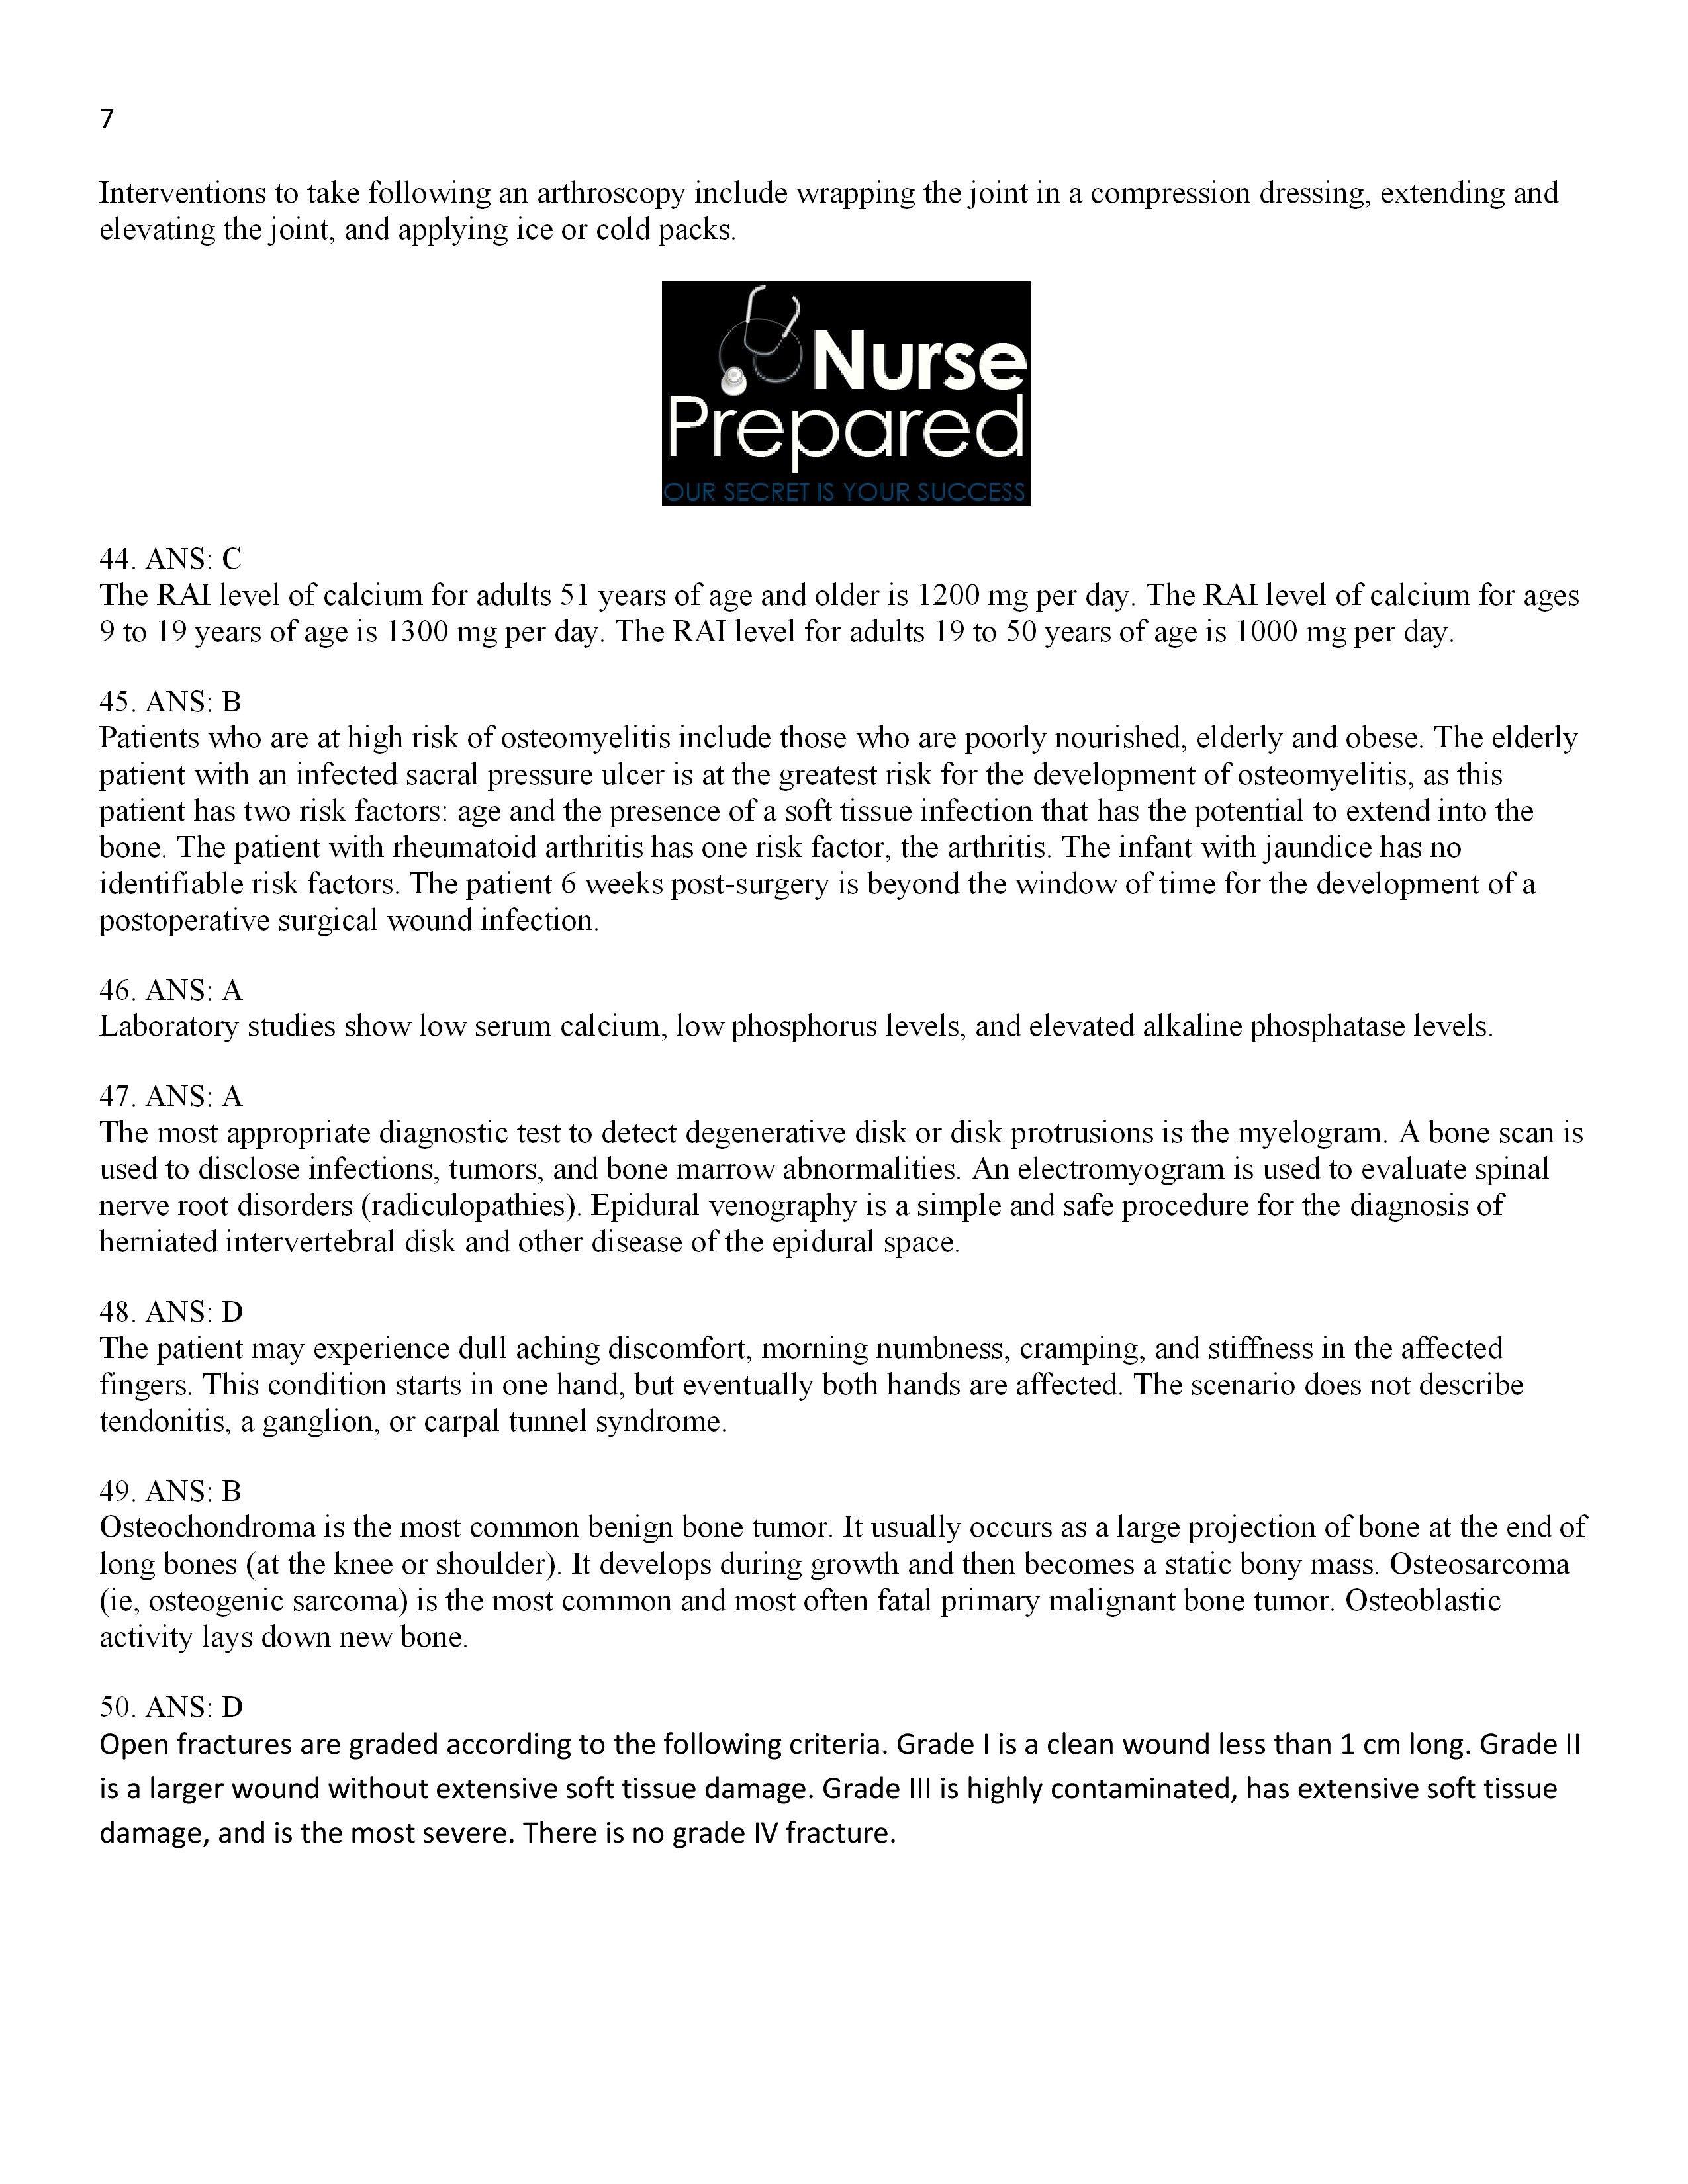 Pathophysiology Exam 2 Answers Pg. 7 Nursing